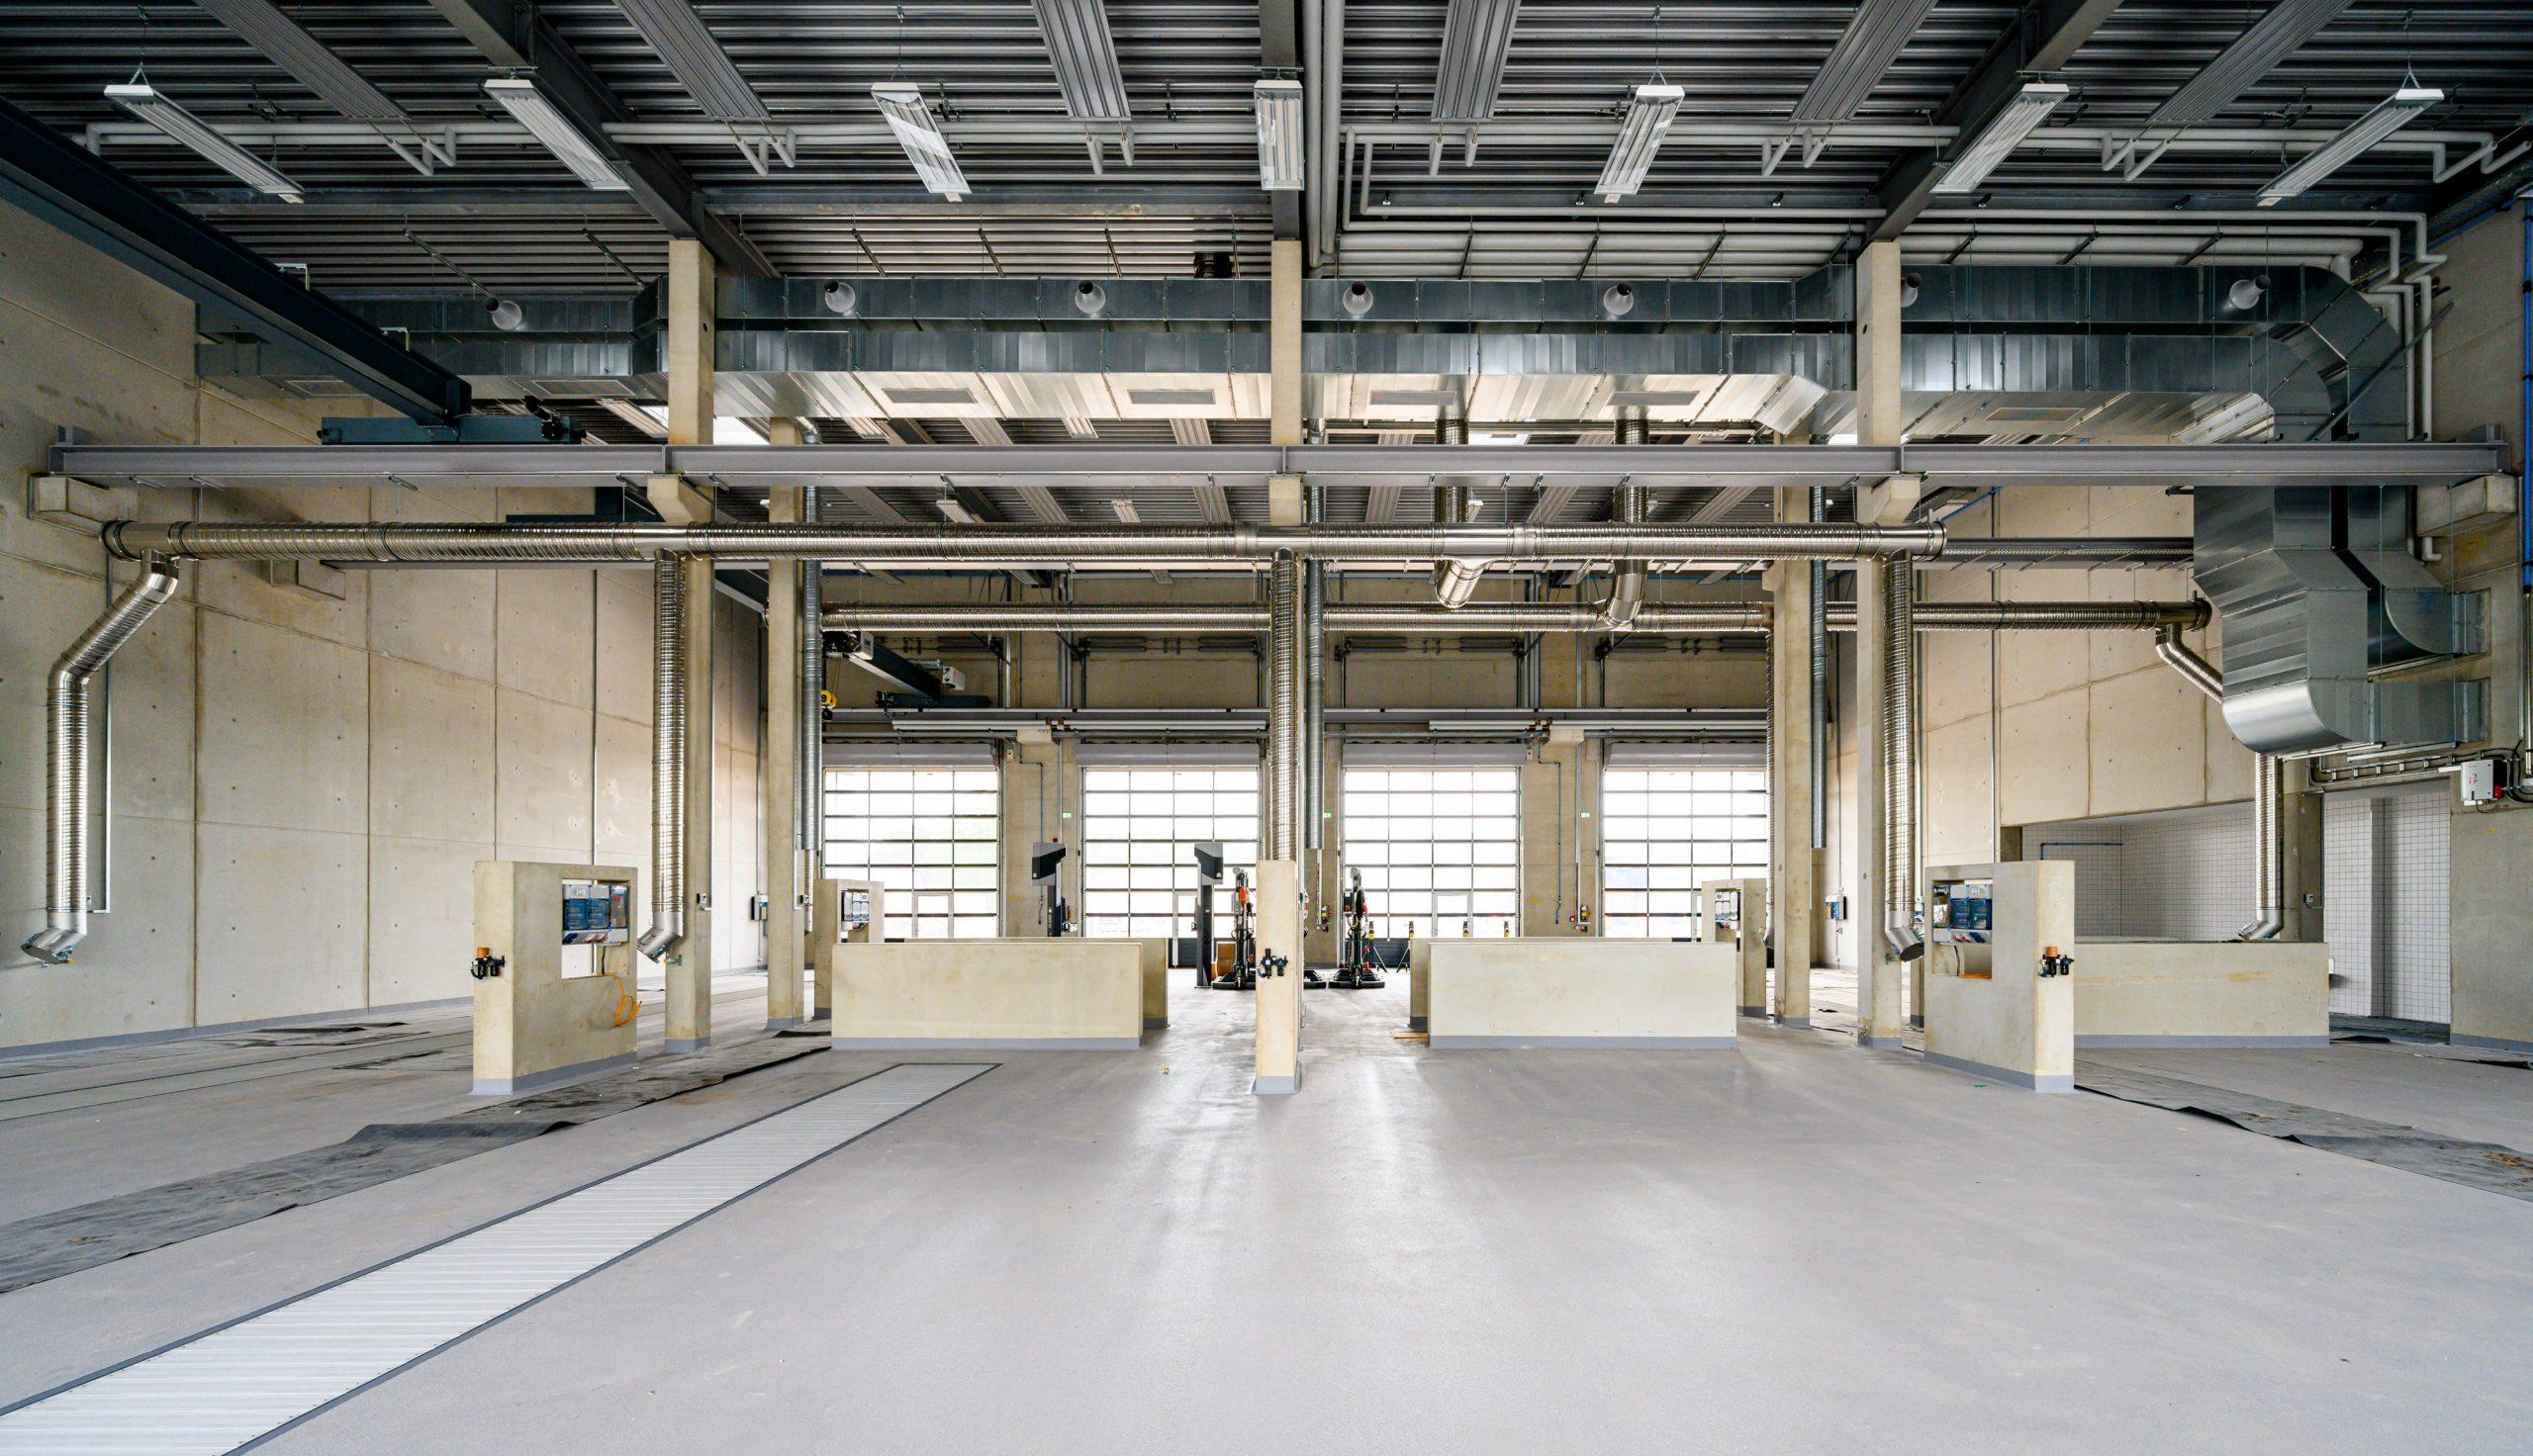 Projektbild 13, Kfz Instandsetzungshalle |  |  H.-J. Zieten Kaserne Beelitz